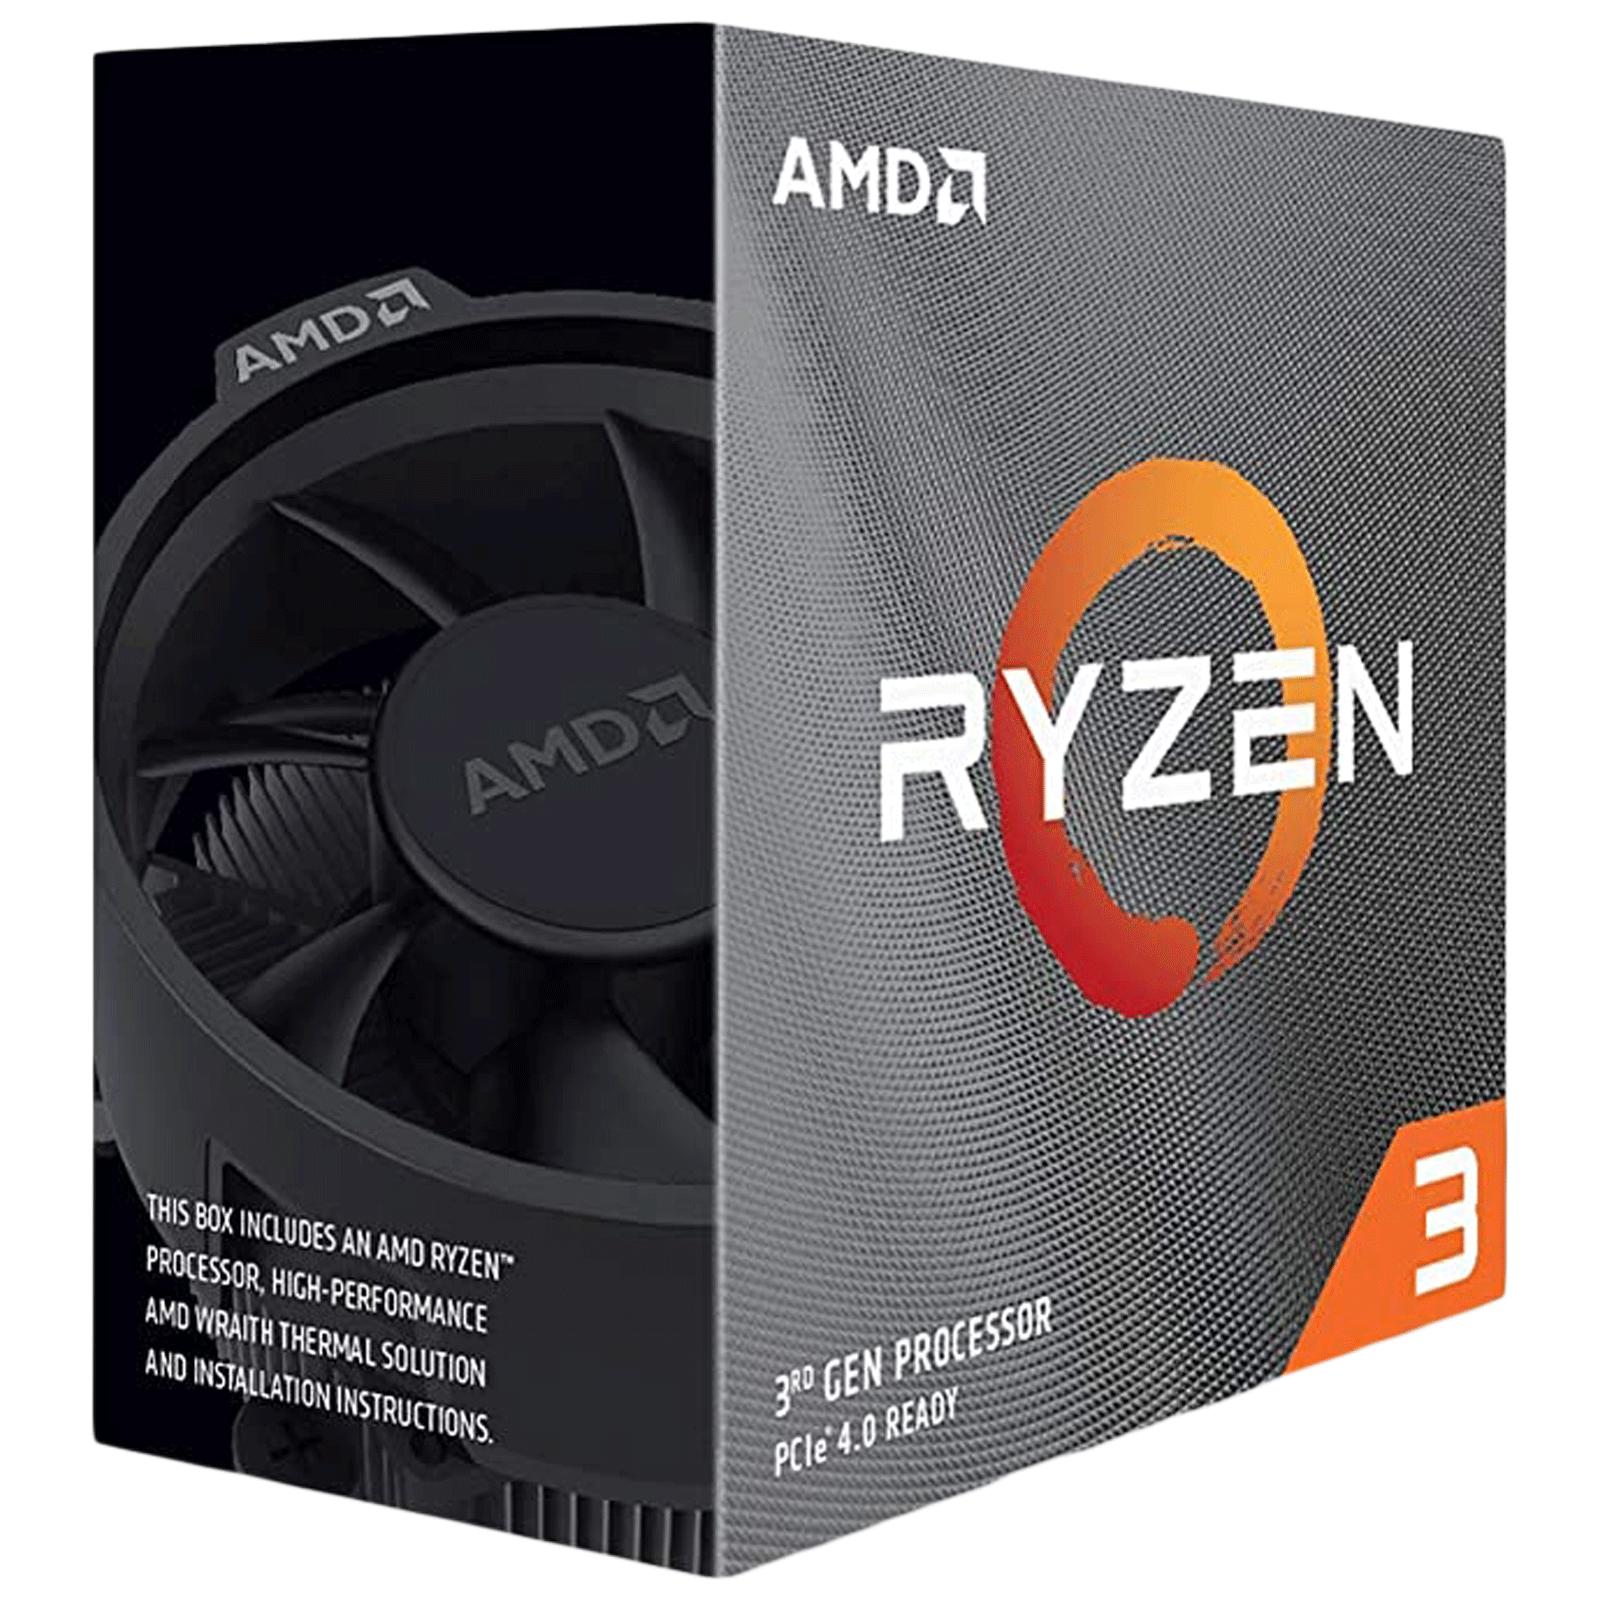 AMD Ryzen 3 Desktop Processor (4 Cores, 3.6 GHz, Unlocked For Overclocking, 3100, Silver)_1